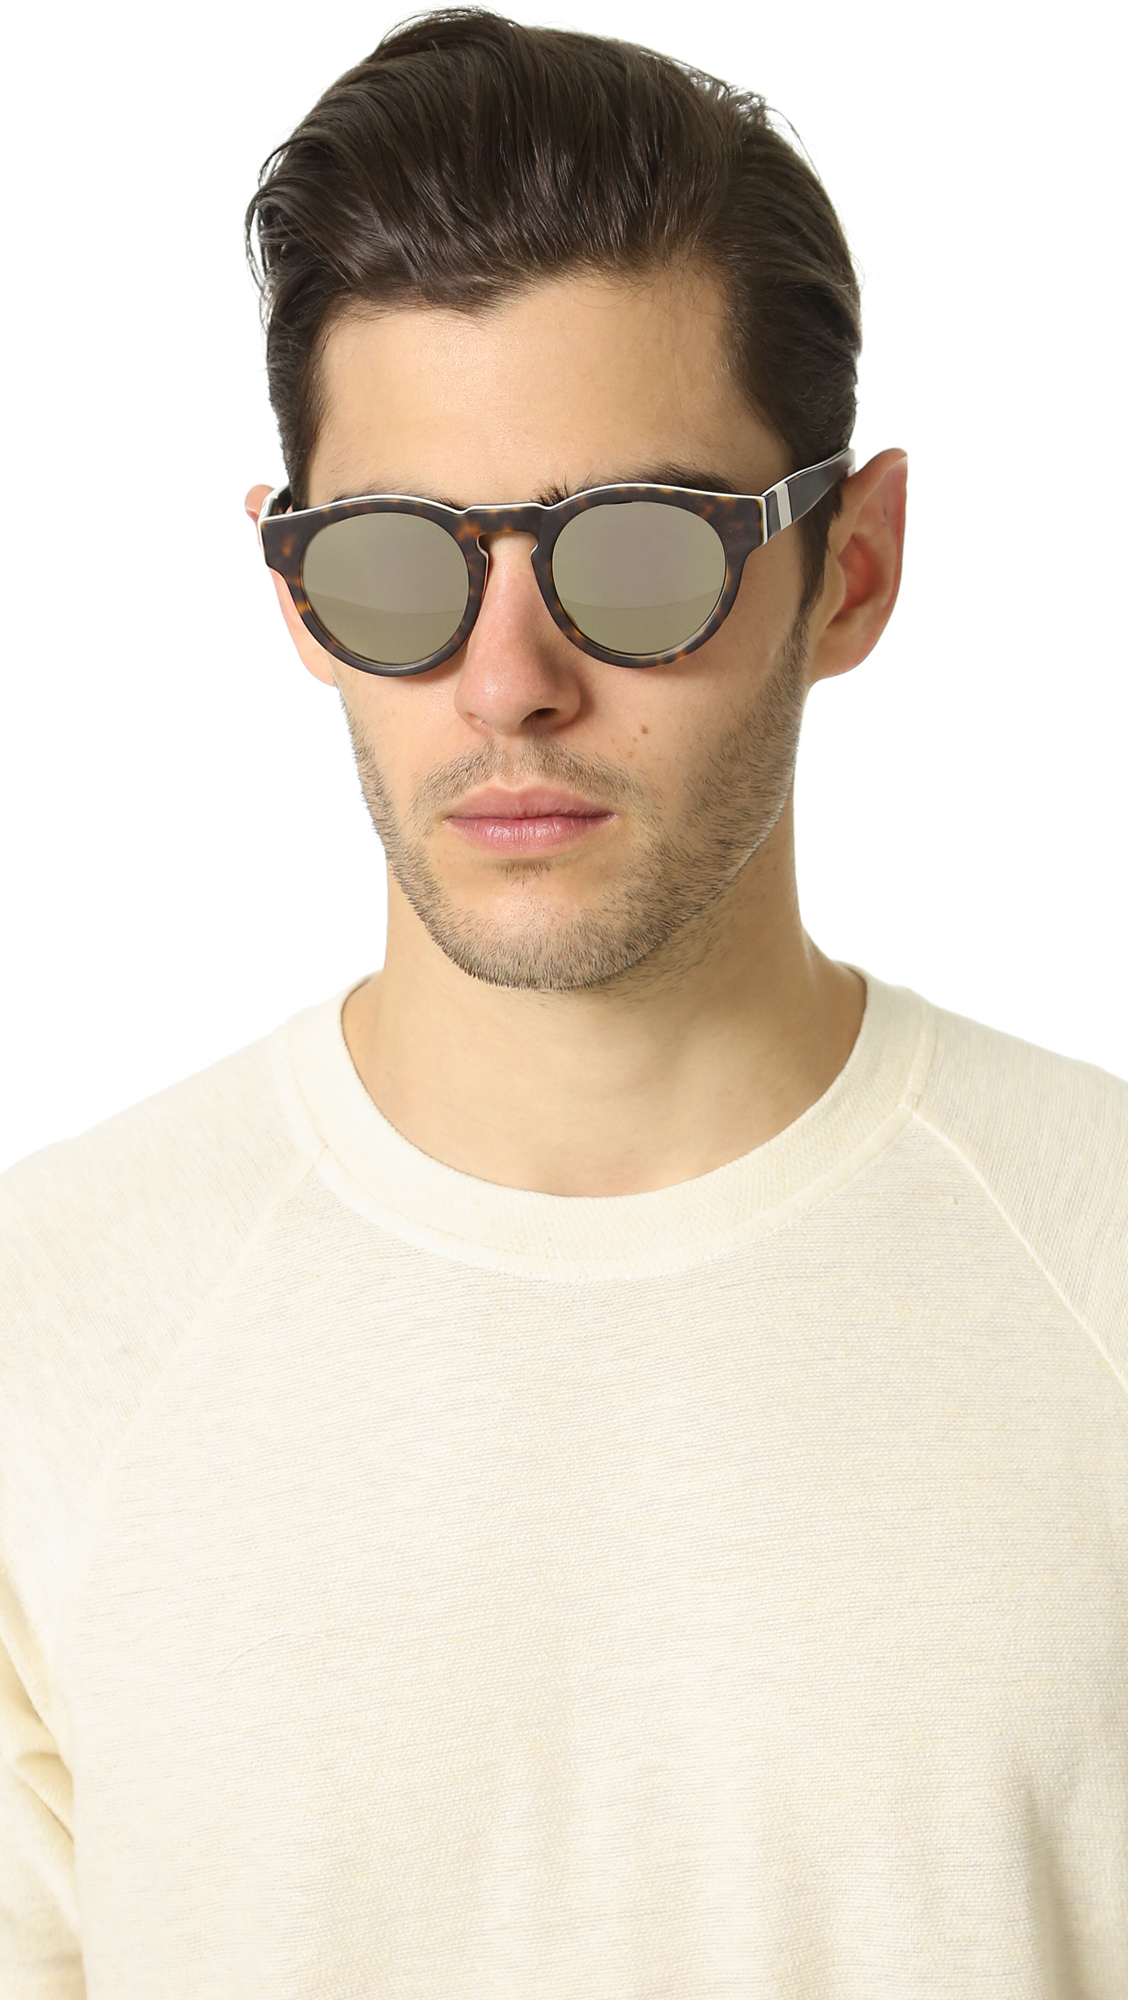 dca519ff3a Lyst - Westward Leaning Voyager 10 Sunglasses in Black for Men